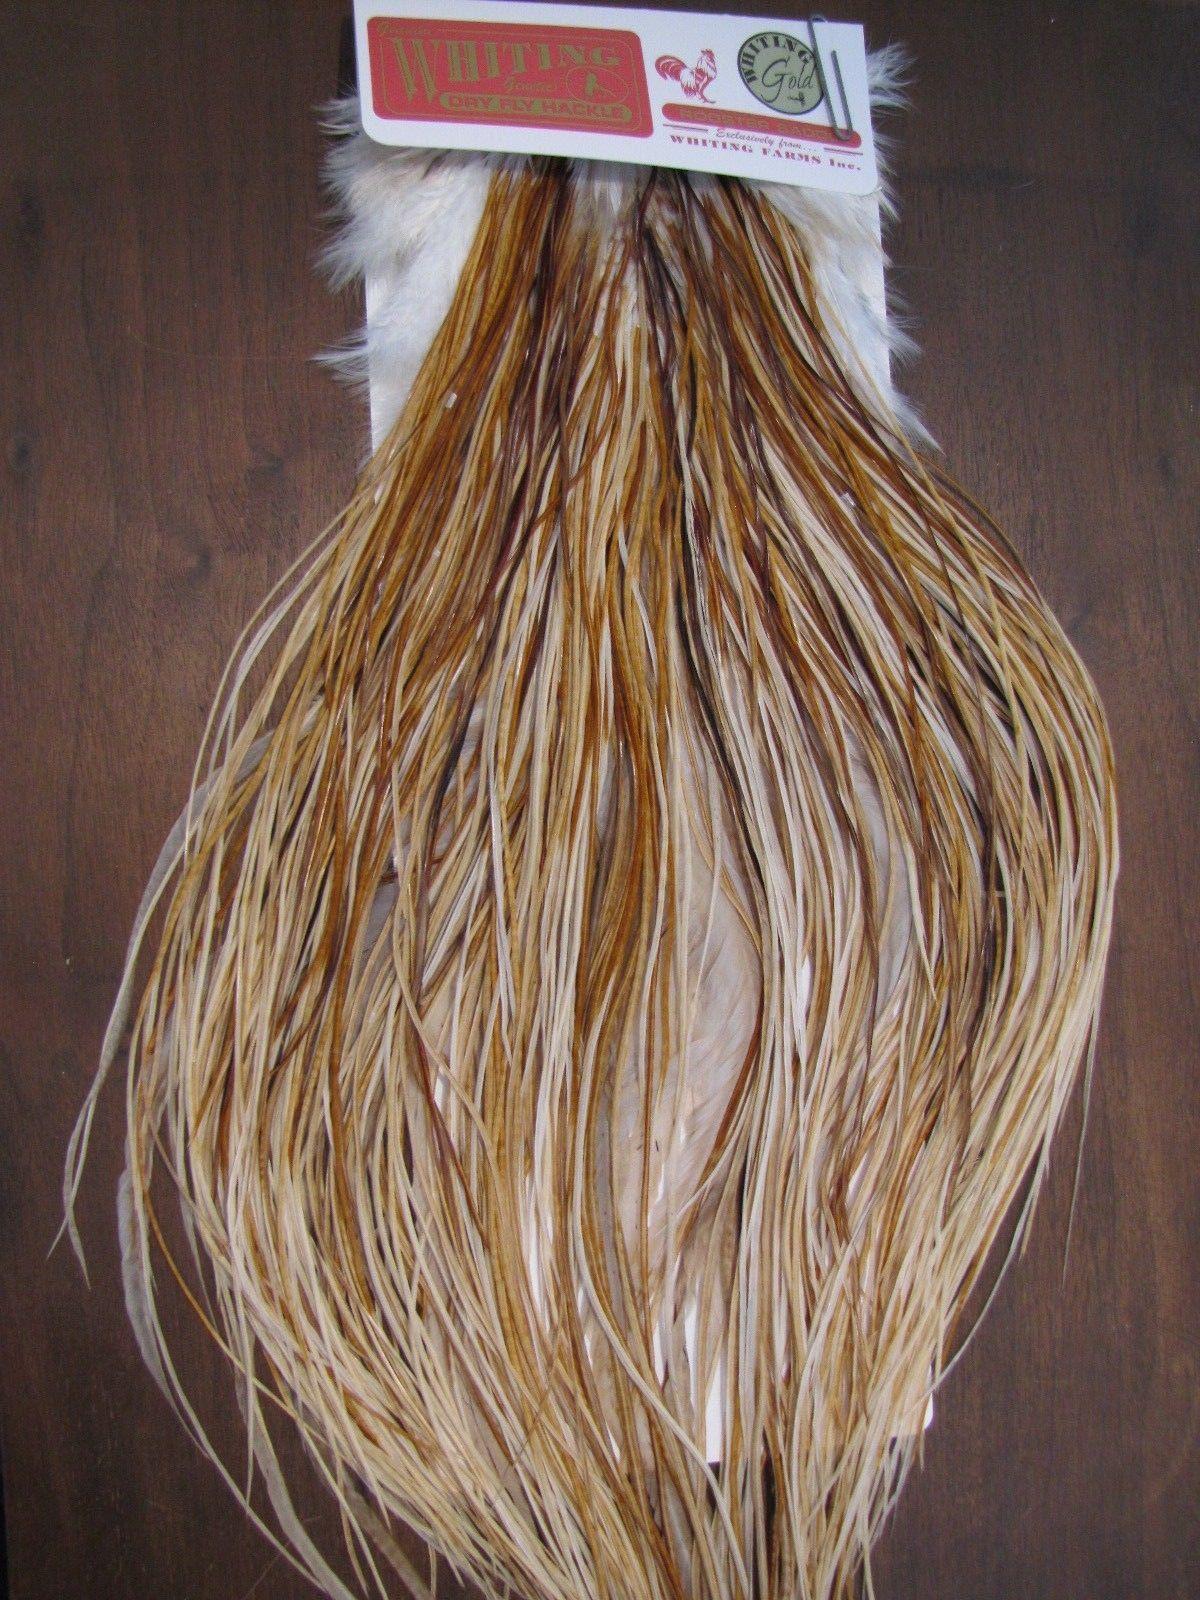 Angelsport-Köder, -Futtermittel & -Fliegen Fly Tying Whiting Gold Rooster Saddle Light Ginger #A